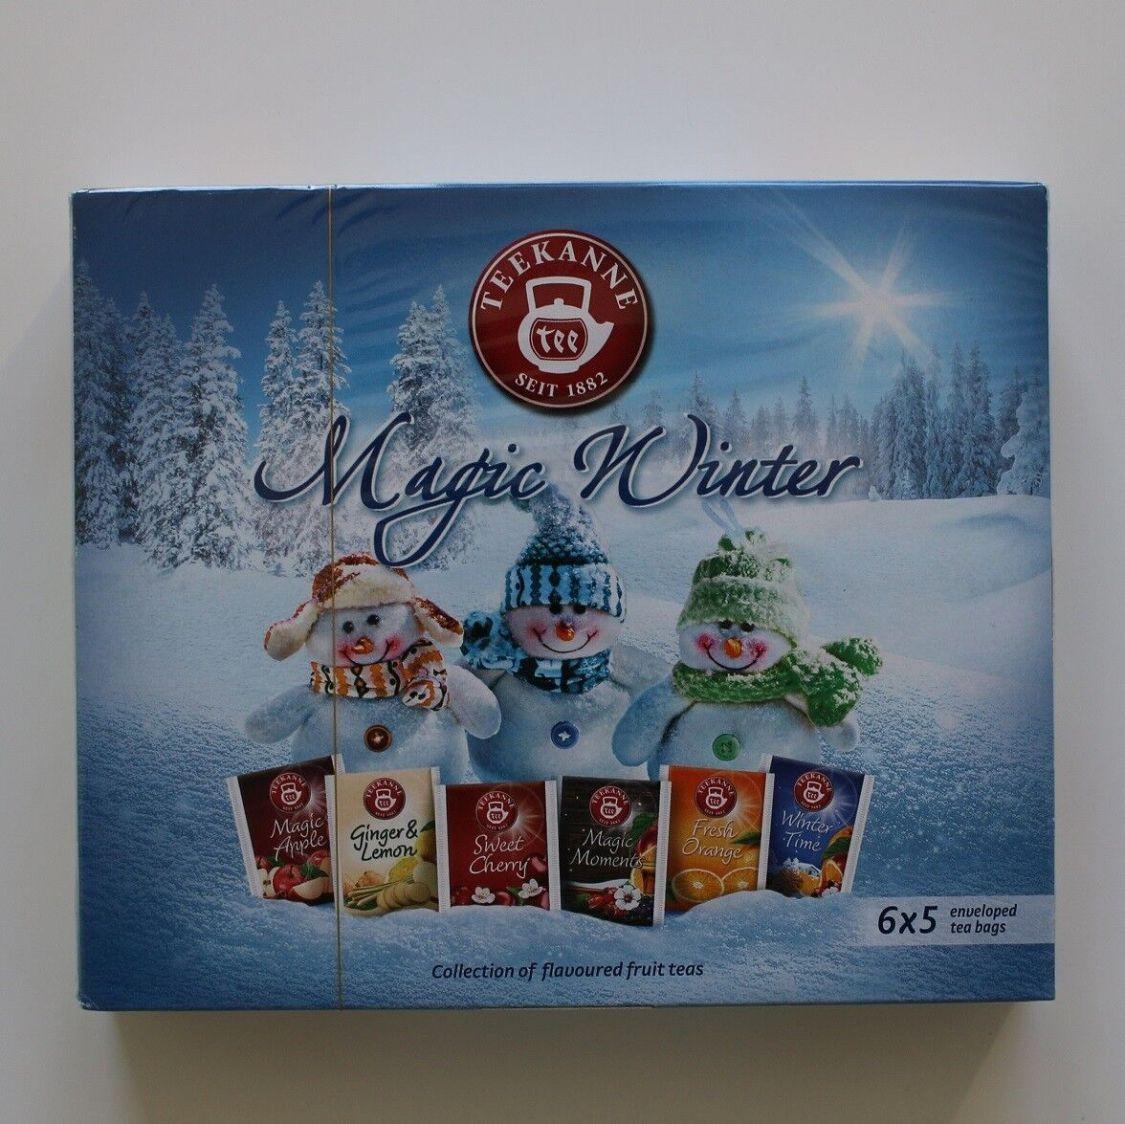 TEEKANNE Tee - Magic Winter Tea 30 Teebeutel Früchtetee 6 Sorten in eine Box